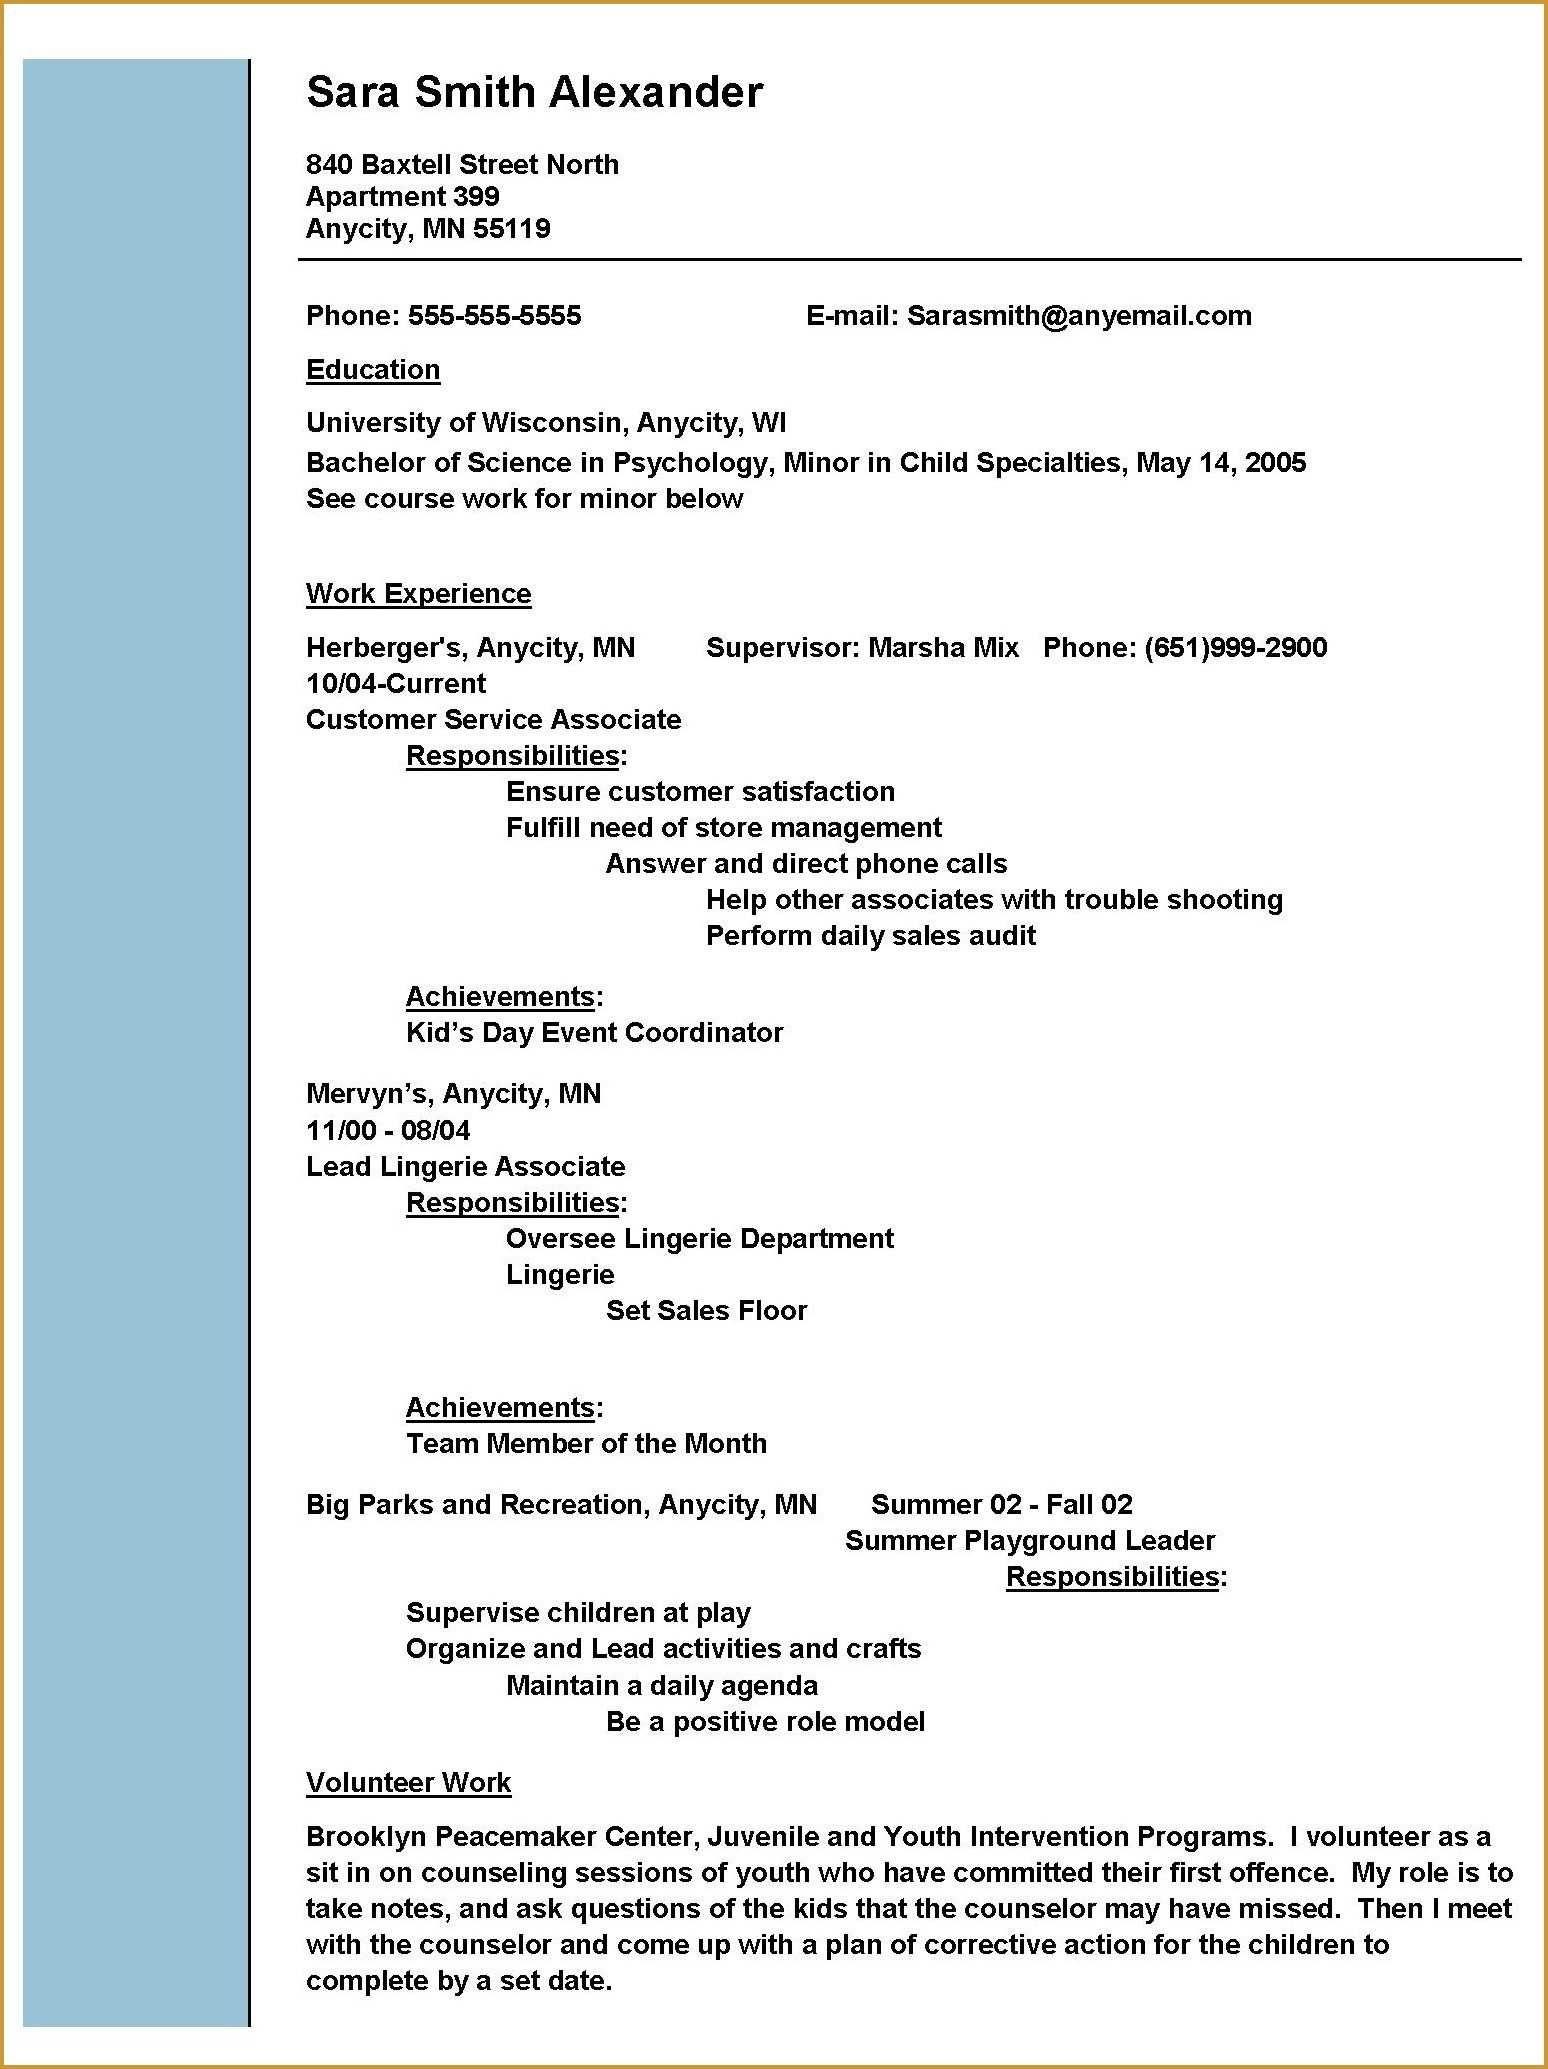 35 Excellent Child Care Provider Skills For Resume We I82133 Resume Samples Resume Skills Resume Examples Sample Resume